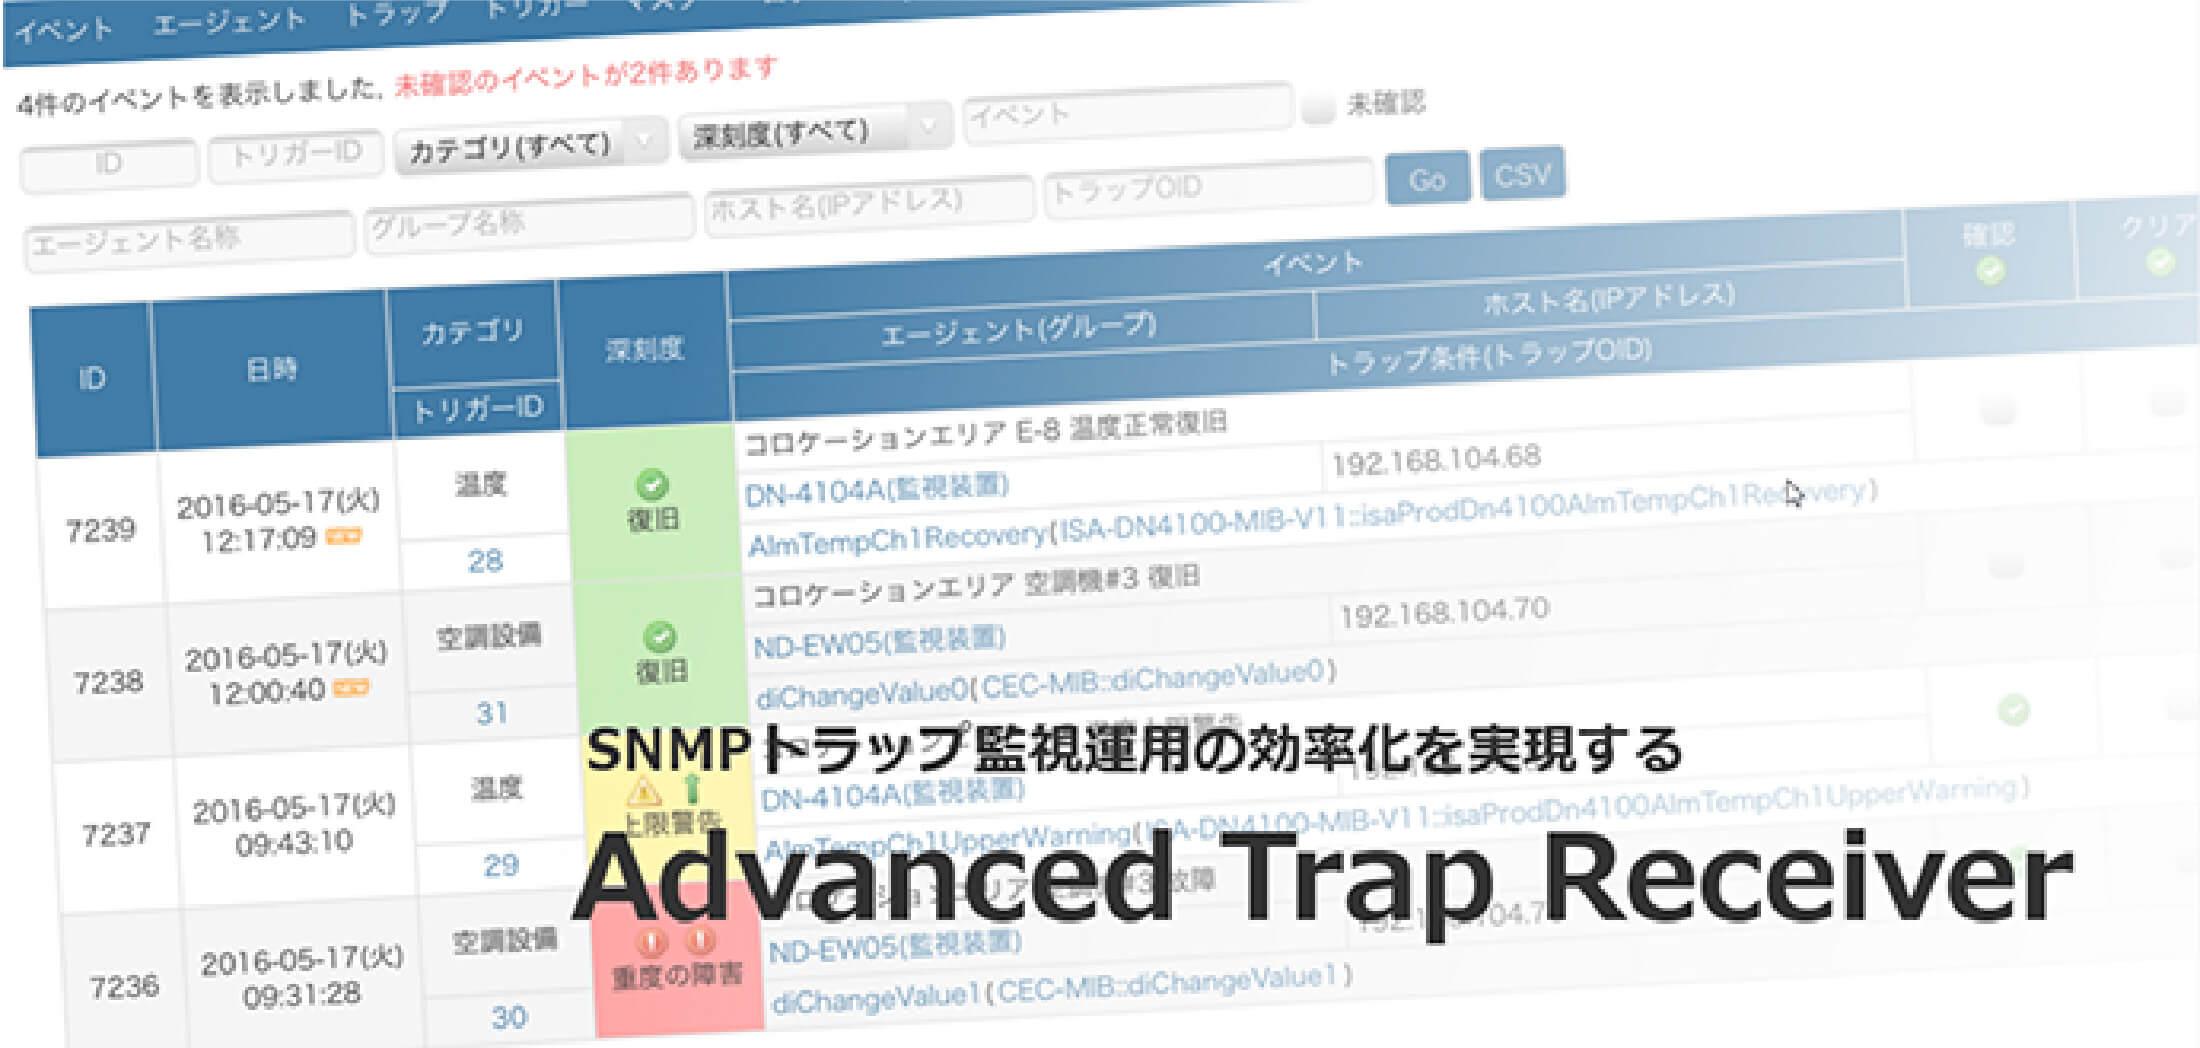 Advanced Trap Receiver(アドバンスド トラップ レシーバー)